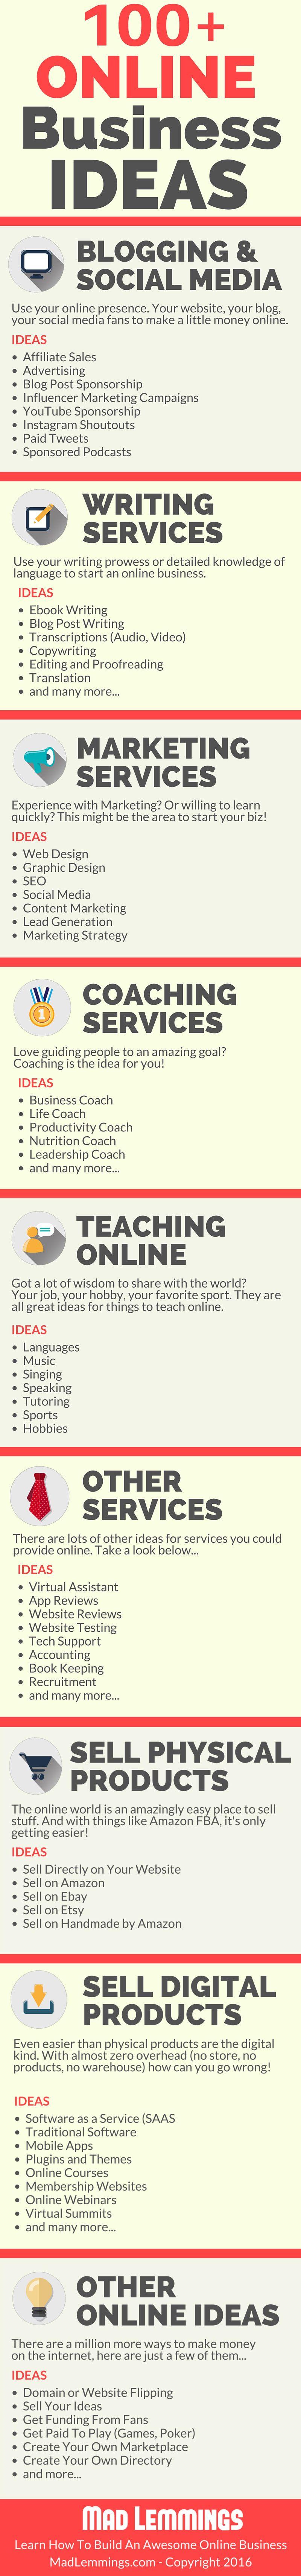 100 Online Business Ideas